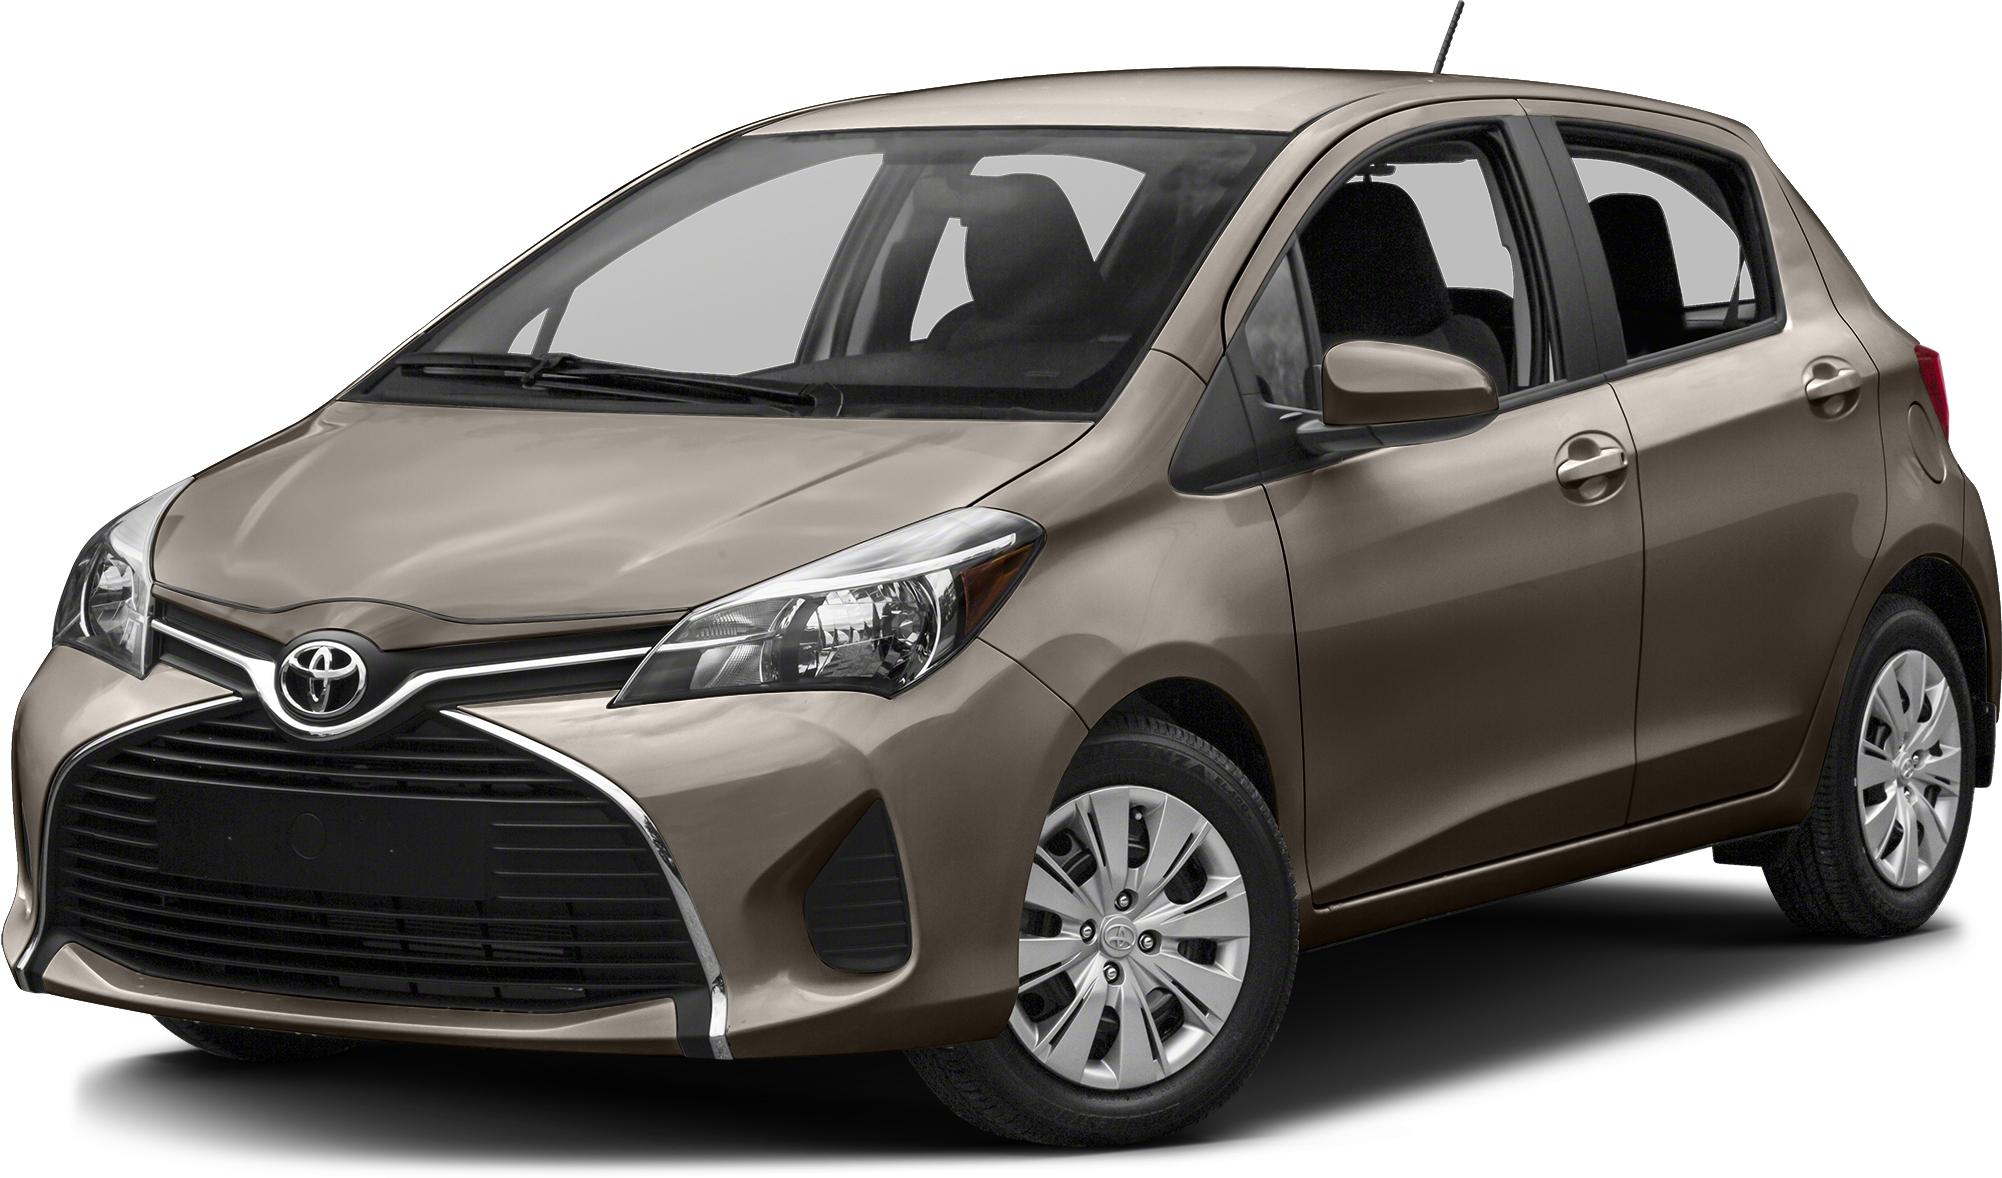 Toyota Used Cars For Sale Buffalo Ny